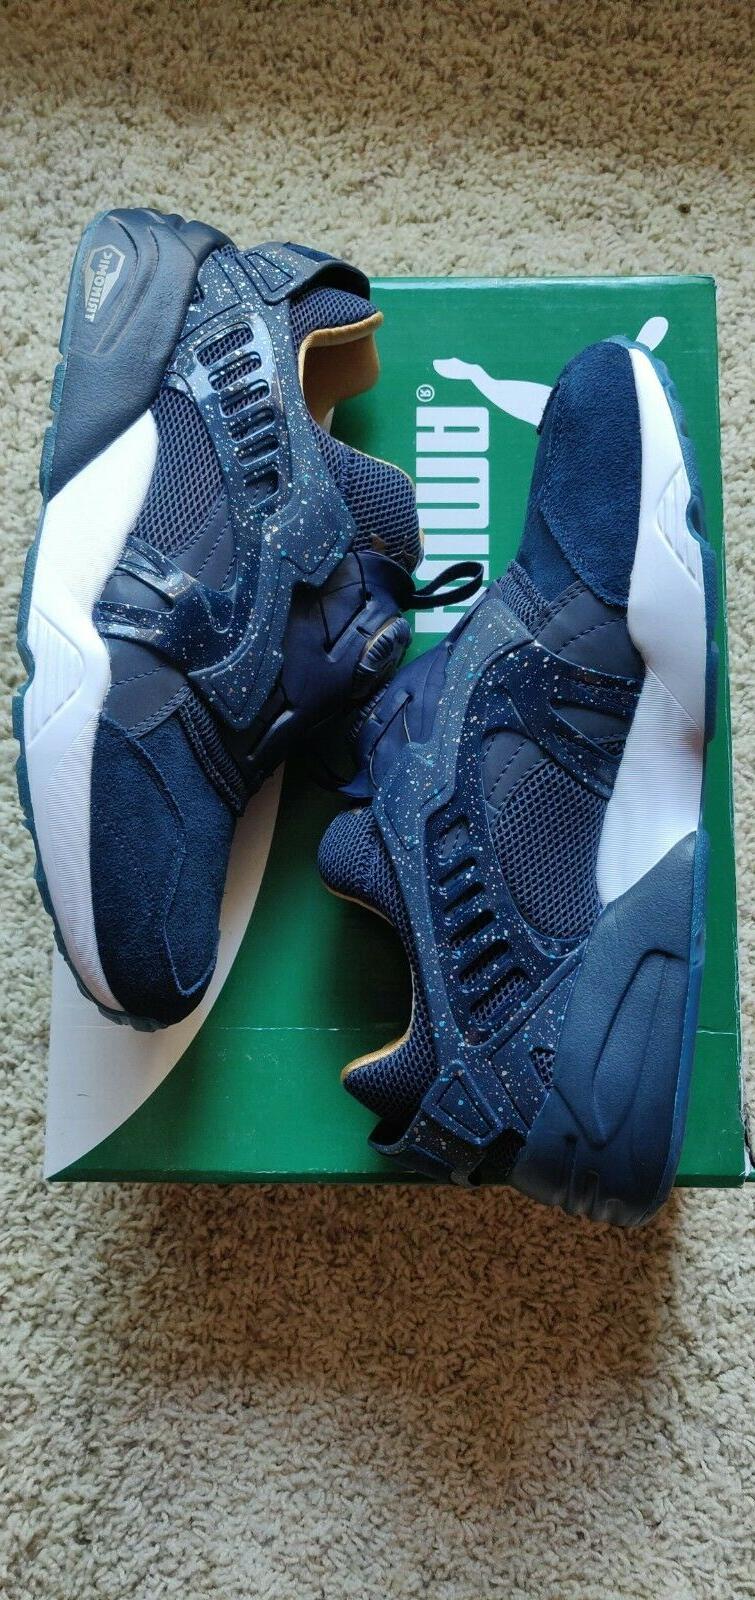 Puma x Blaze size 10 new box